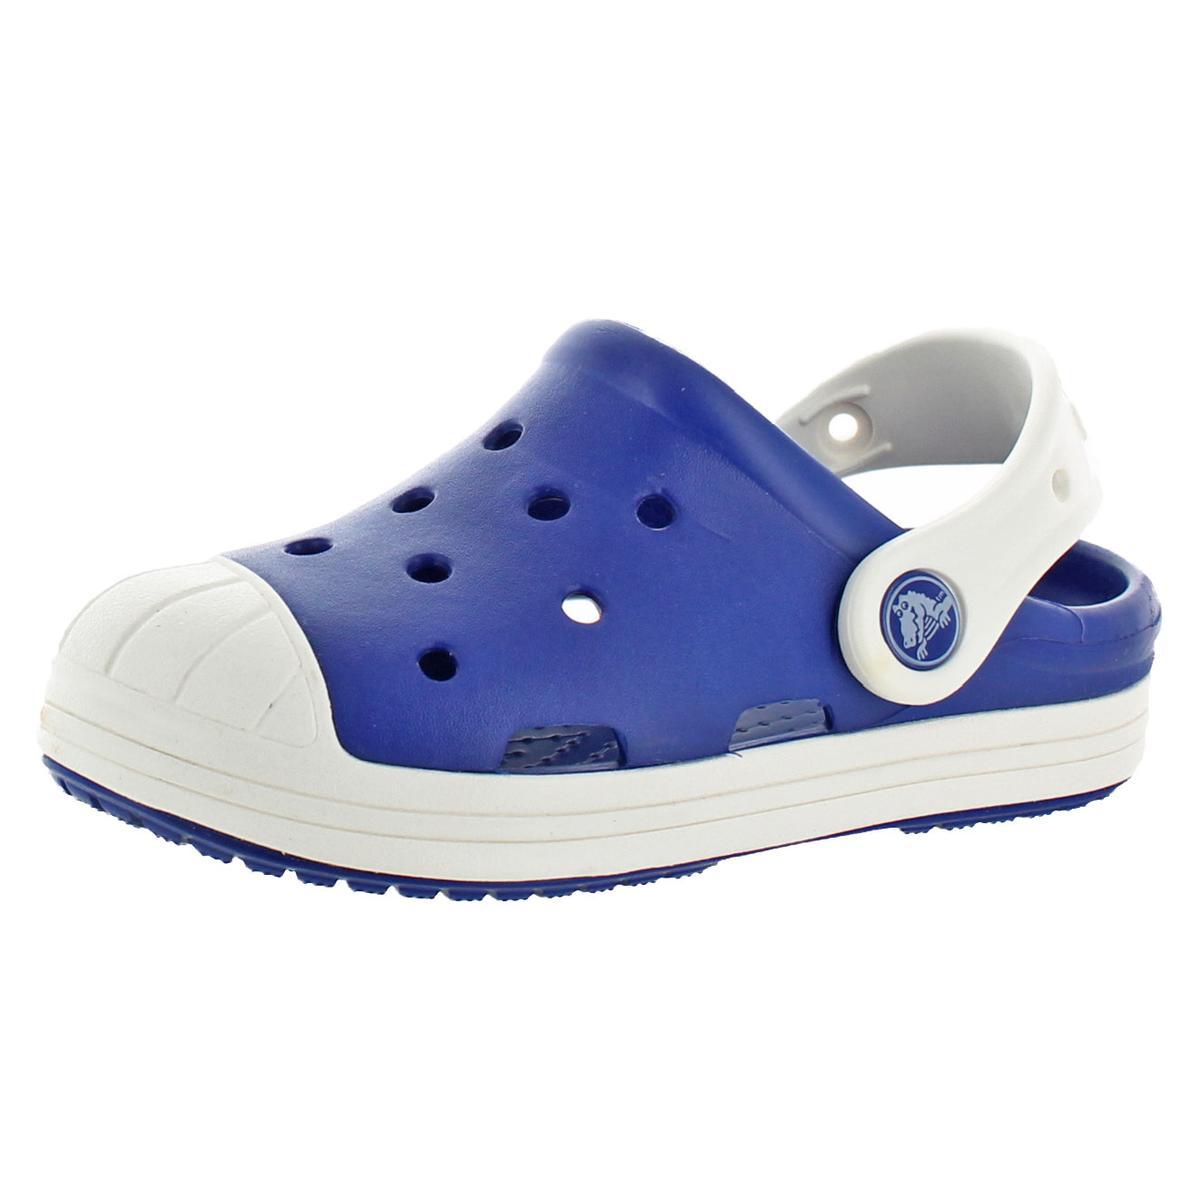 866ebb317 BHFO  Crocs Unisex Kids Bump It Croslite Clog Shoes